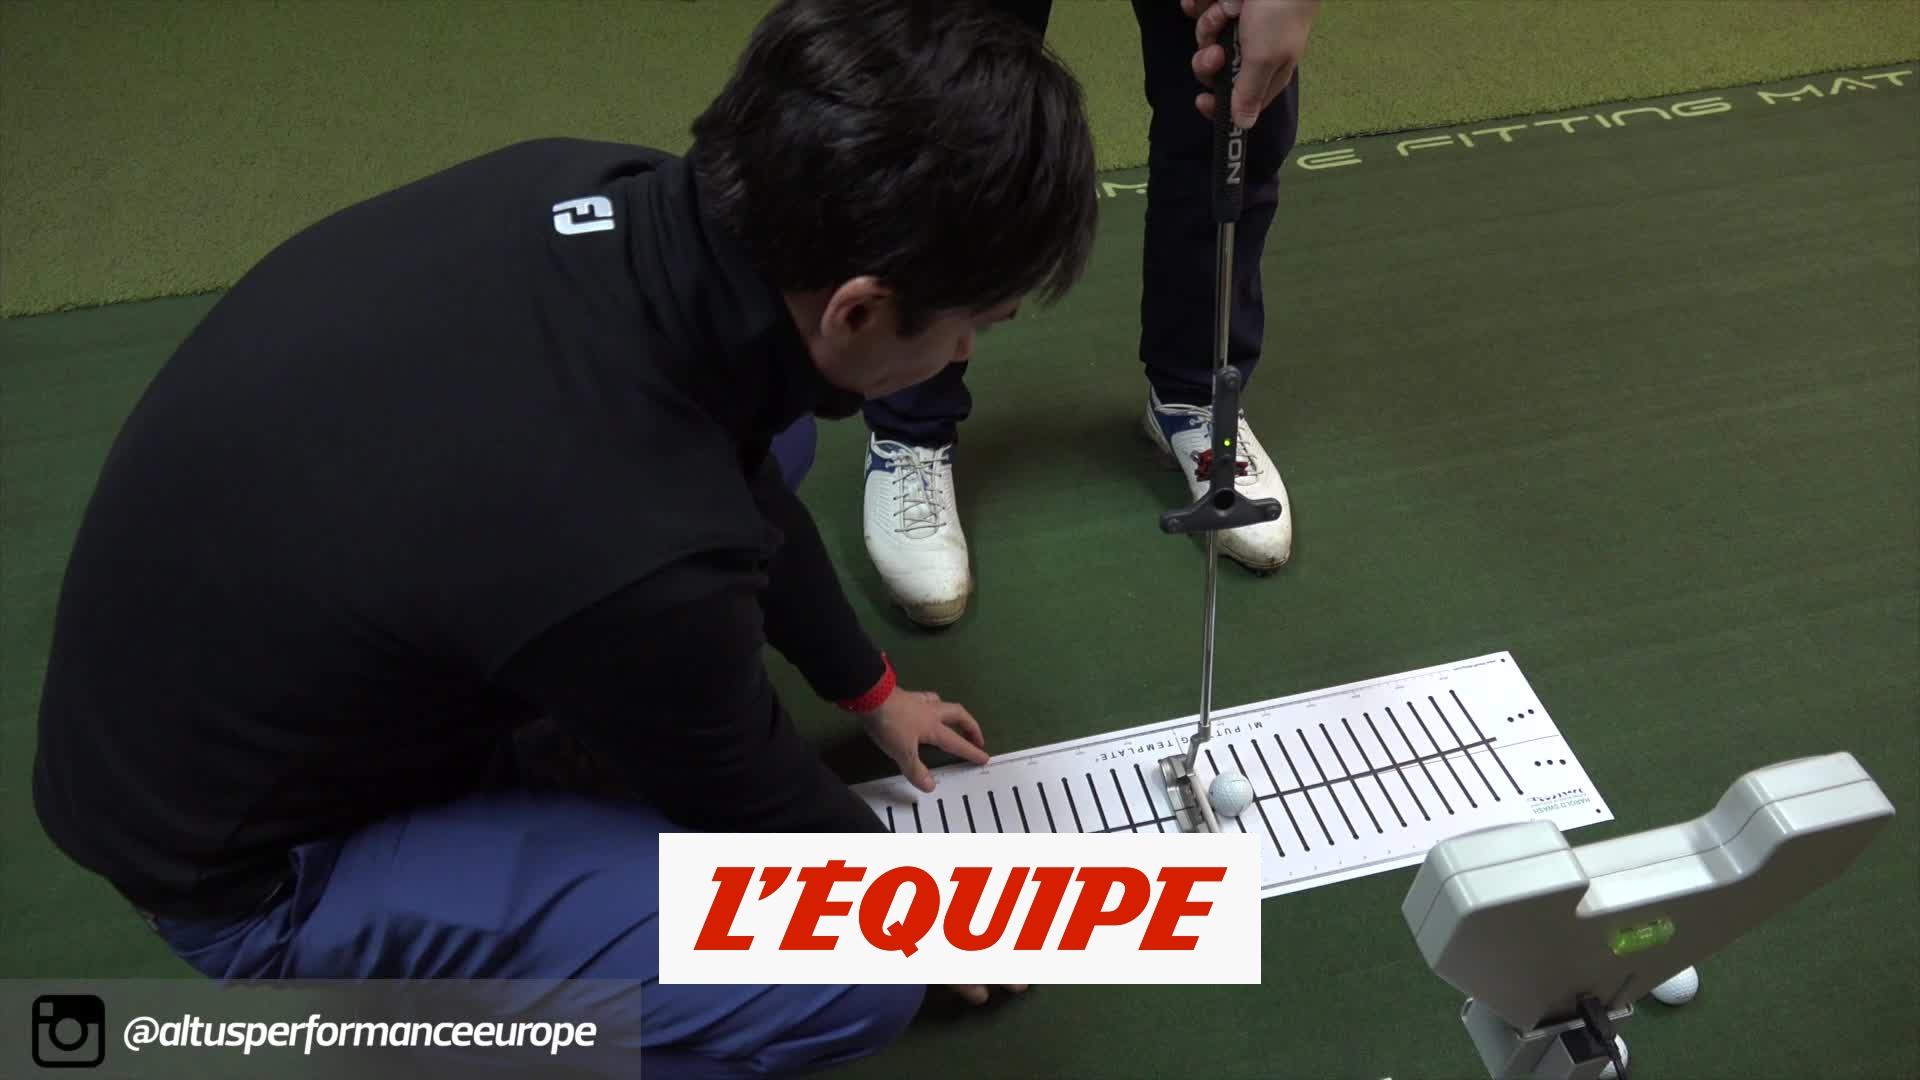 Vérifier son putting – Golf – Altus